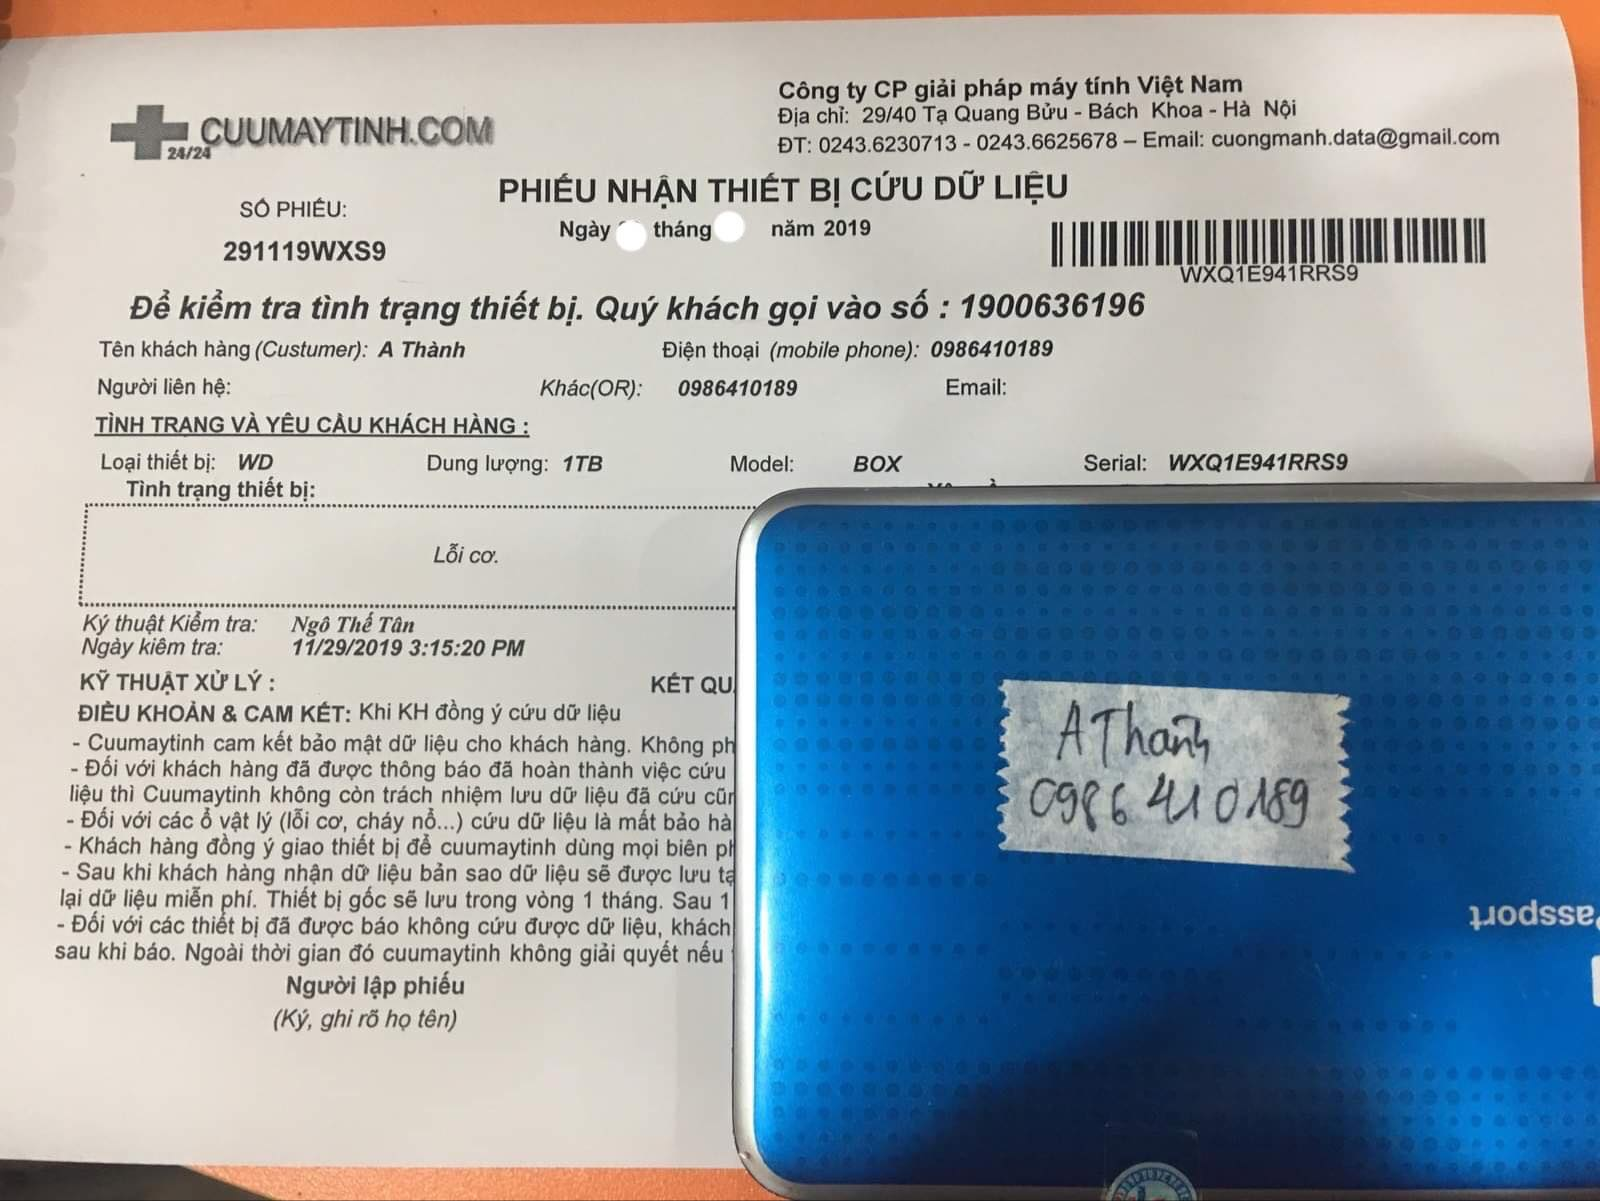 Cứu dữ liệu ổ cứng Western 1TB lỗi cơ 12/12/2019 - cuumaytinh